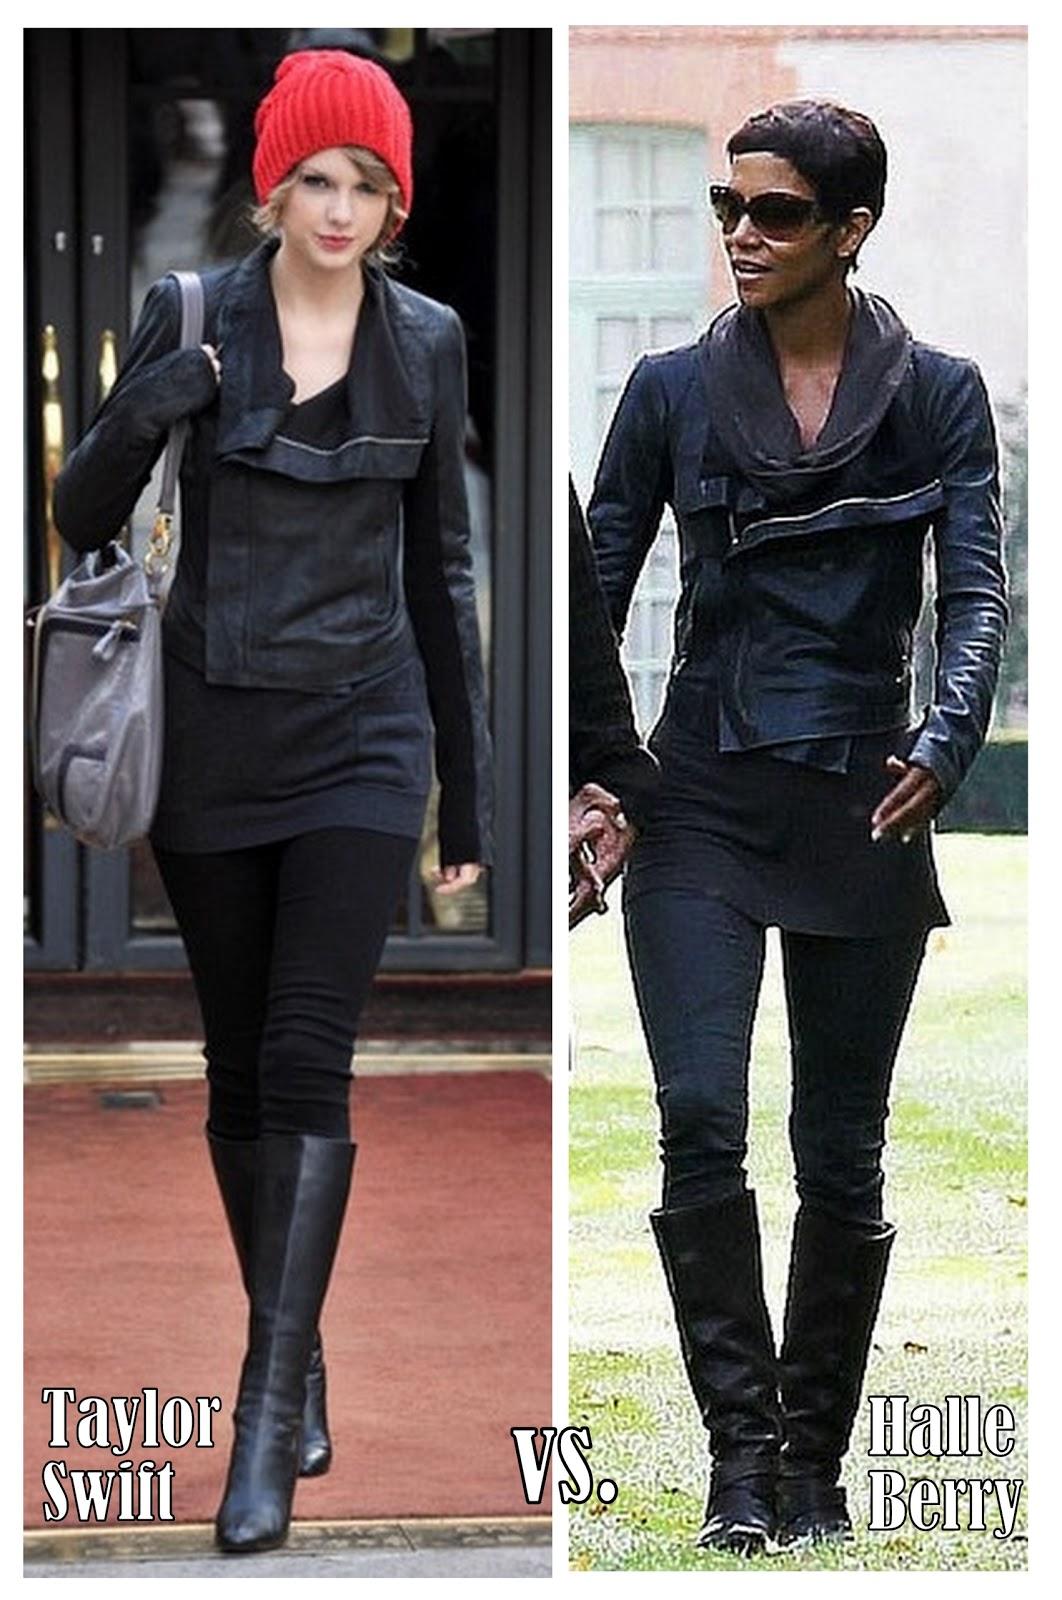 http://2.bp.blogspot.com/_xC9ozoZm8n4/TKhc9NnNmlI/AAAAAAAABgg/BwPUbXU4p2U/s1600/who+wore+it+best+halle+vs+taylor.jpg